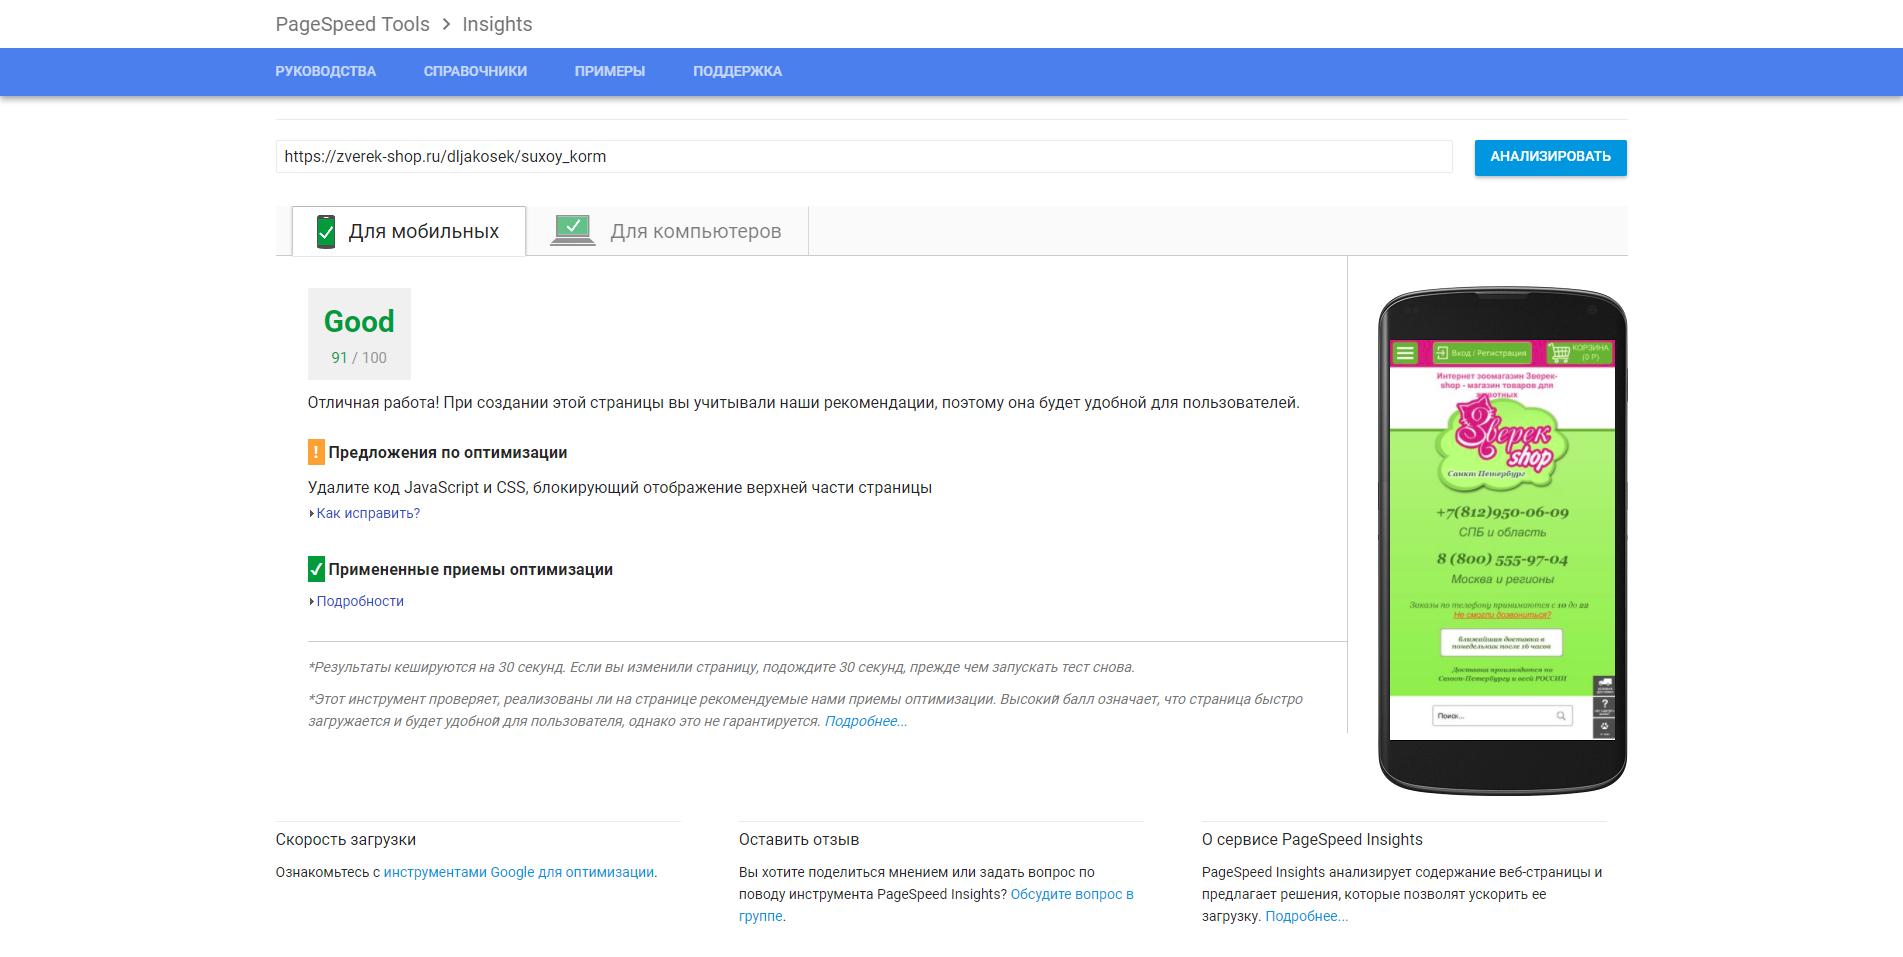 Google PageSpeed оптимизация скорости загрузки сайта интернет-магазина Зверек shop